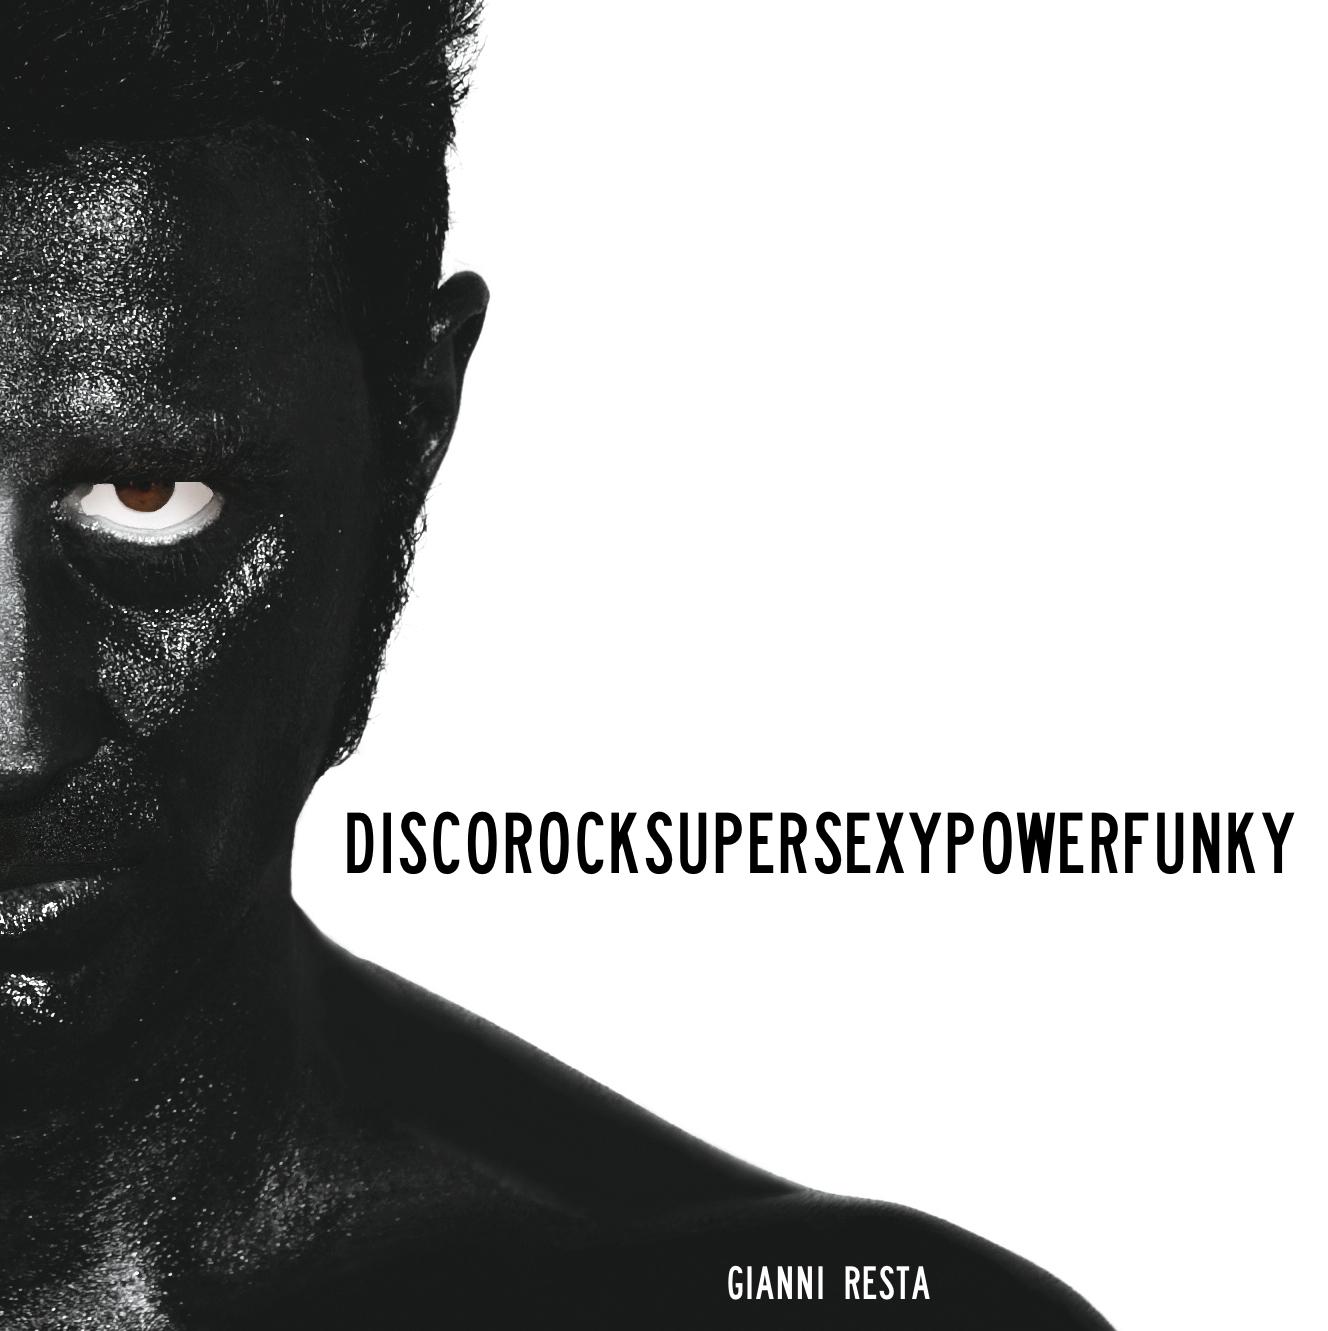 DiscoRockSuperSexyPowerFunky - Gianni Resta